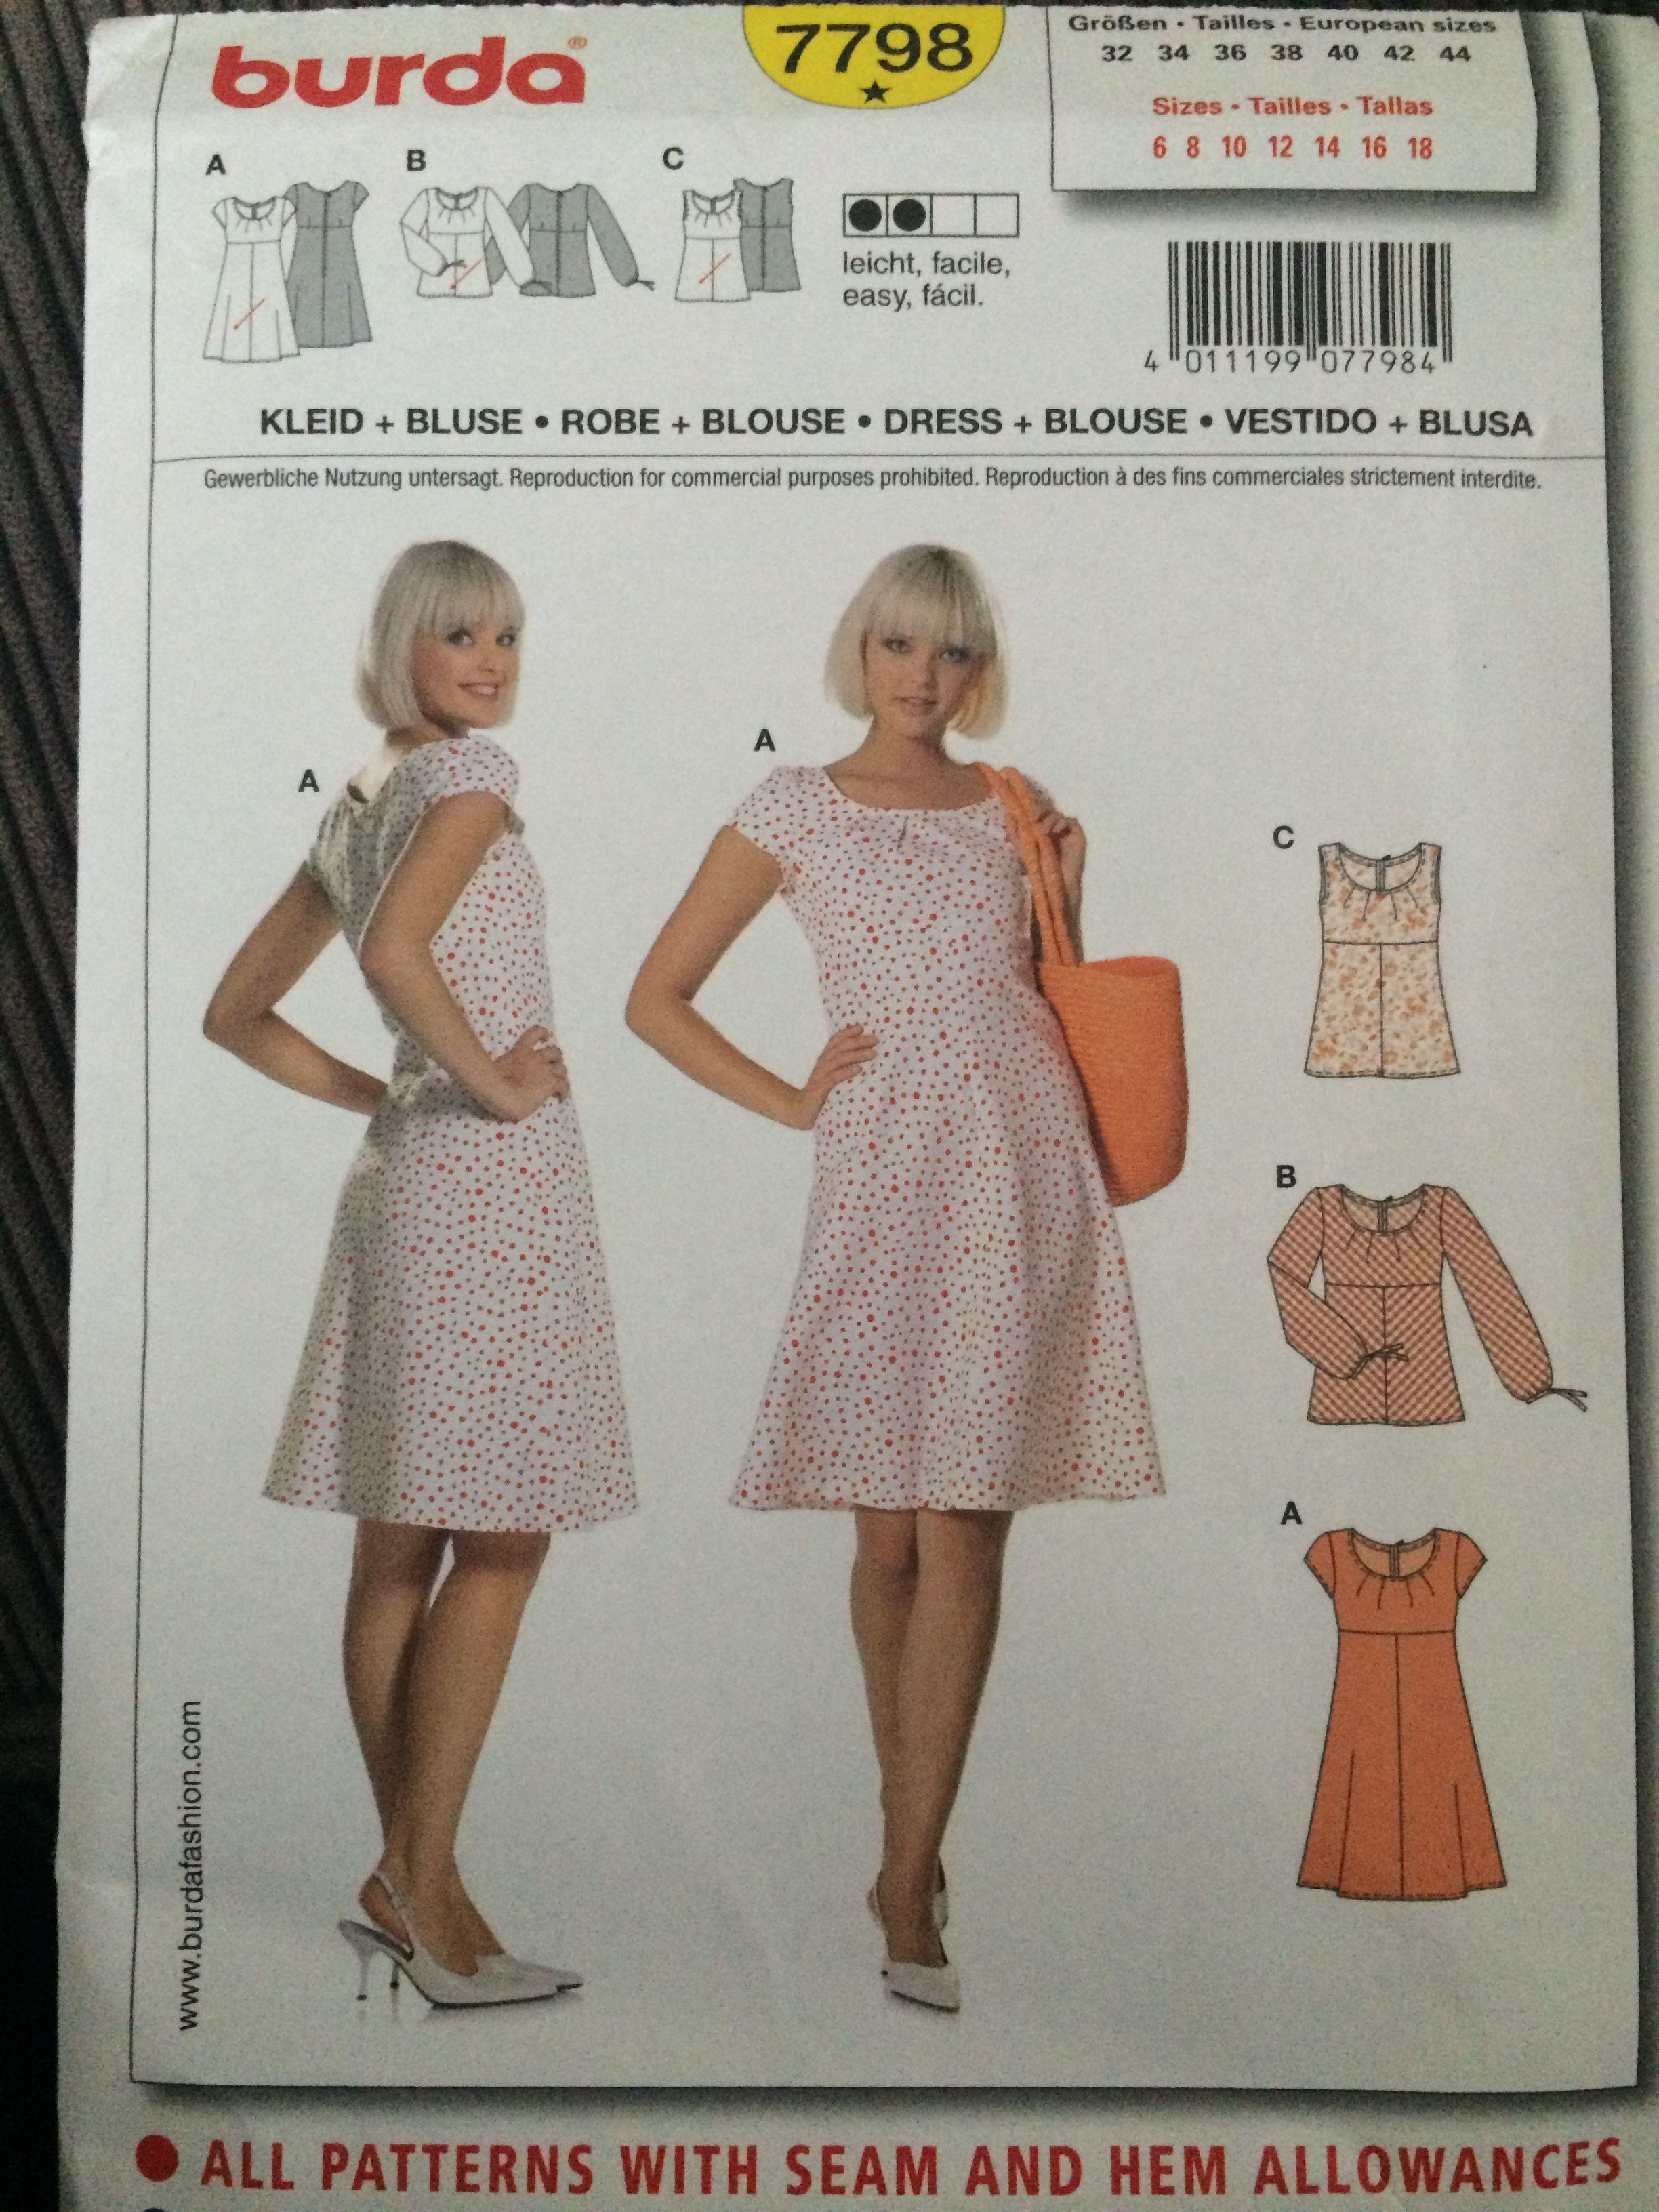 Burda 7798 Dress Sewing Patterns Dress Making Patterns Dresses